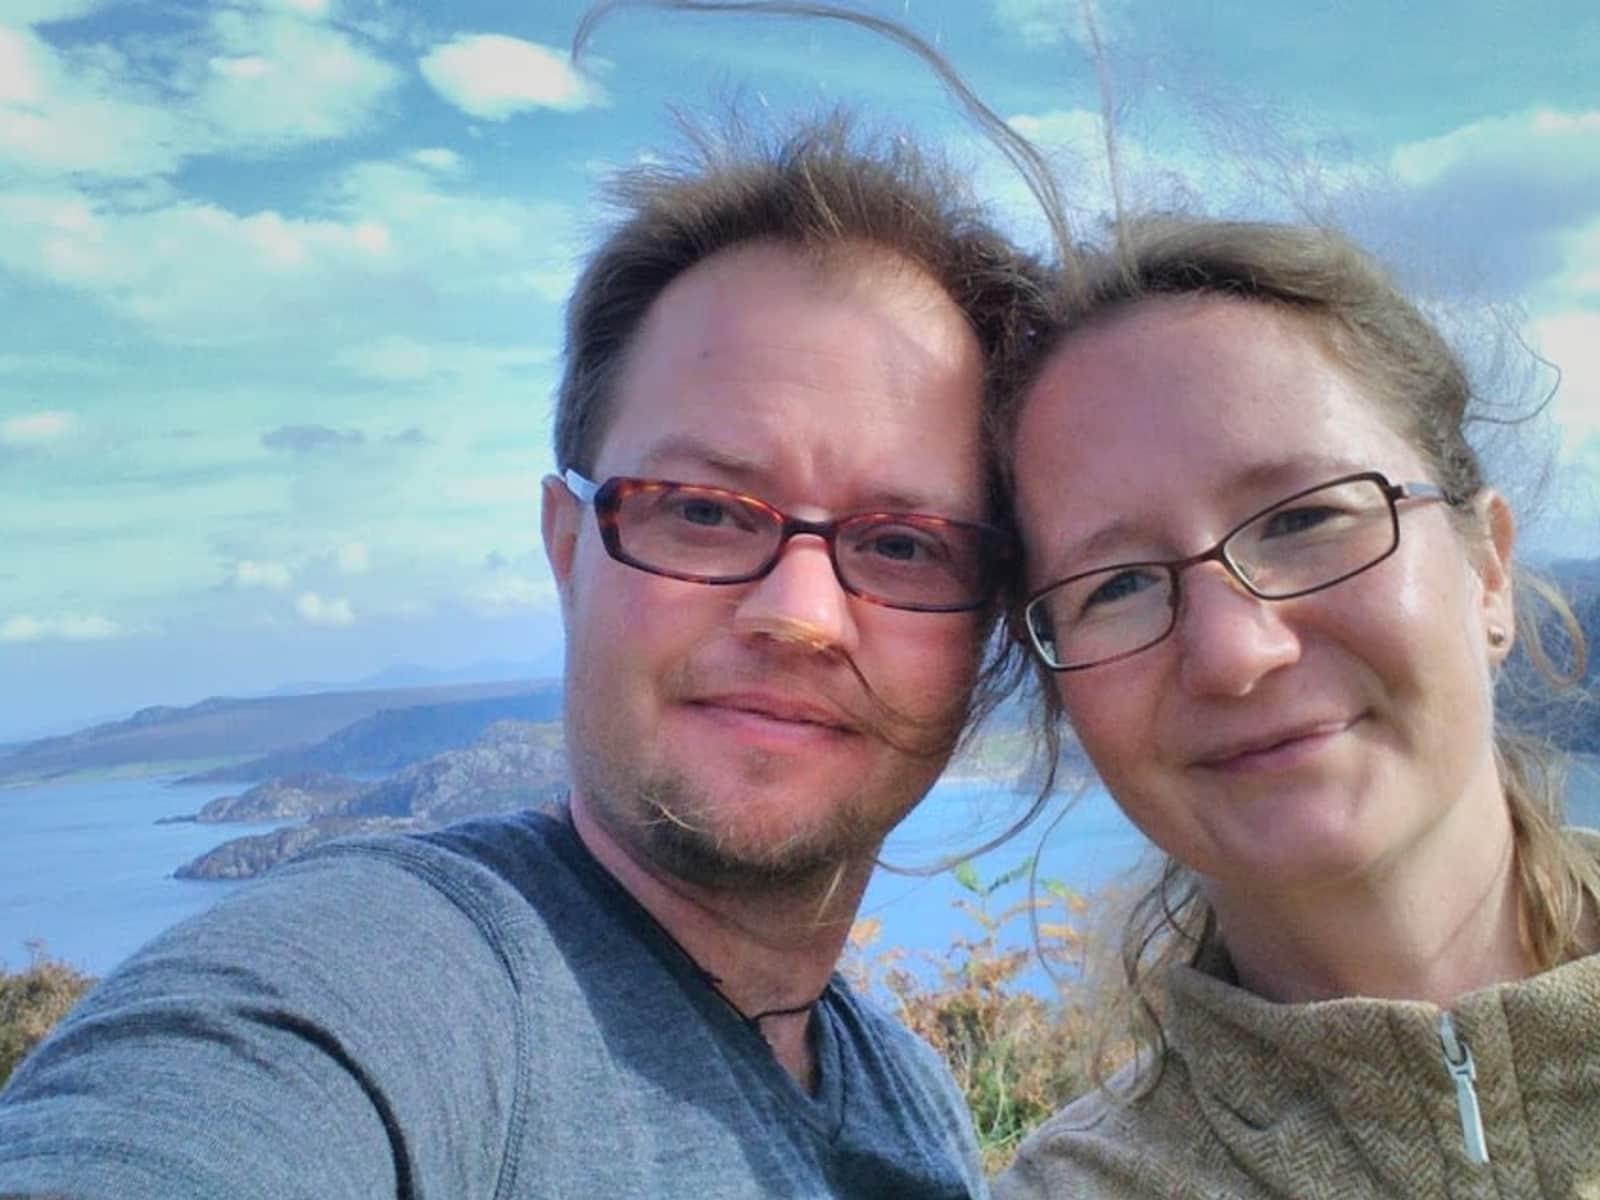 Lukas & Elaine from London, United Kingdom